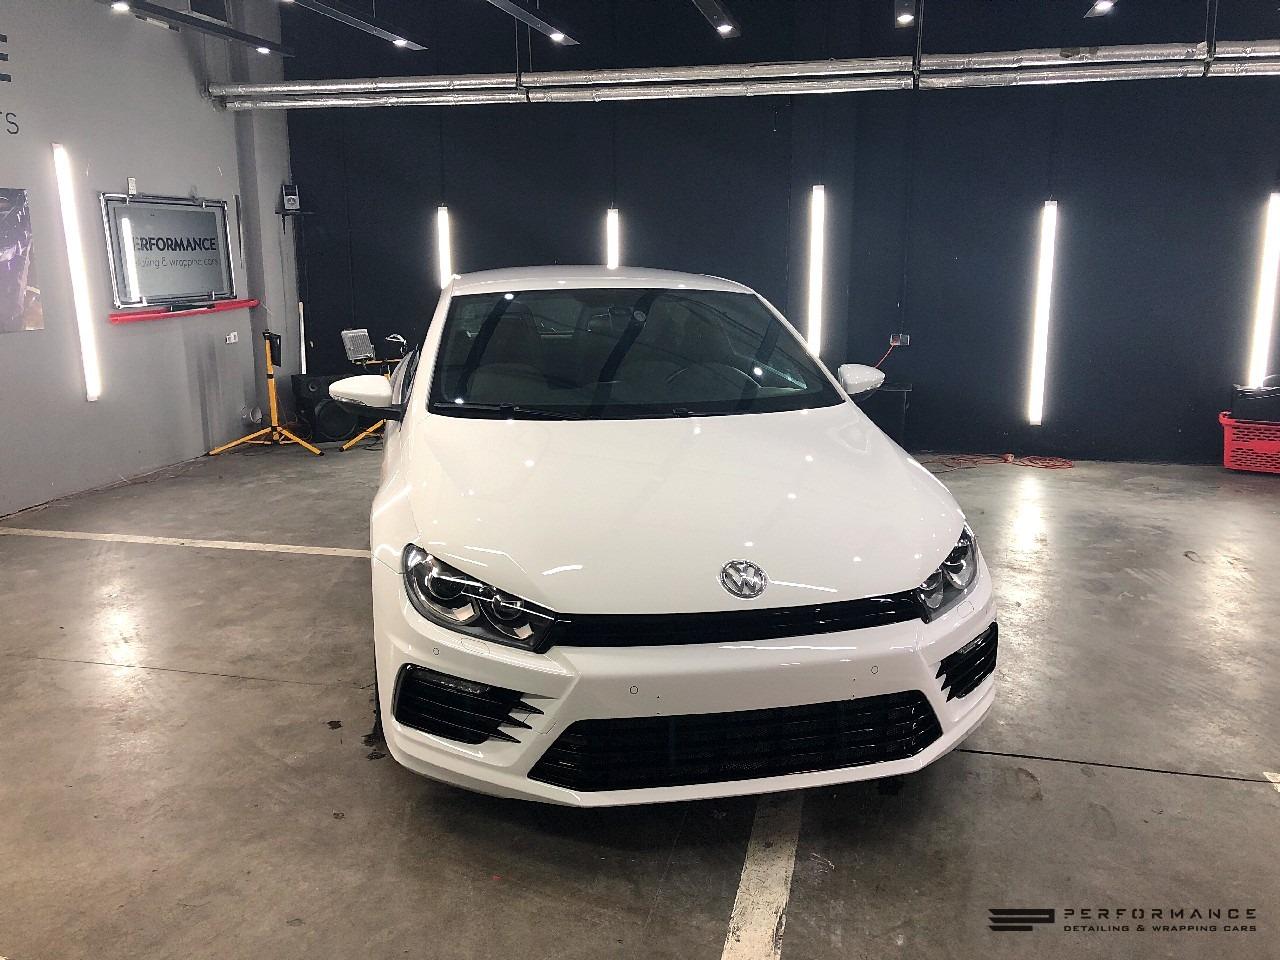 Фото Полировка и воск на Volkswagen Scirocco